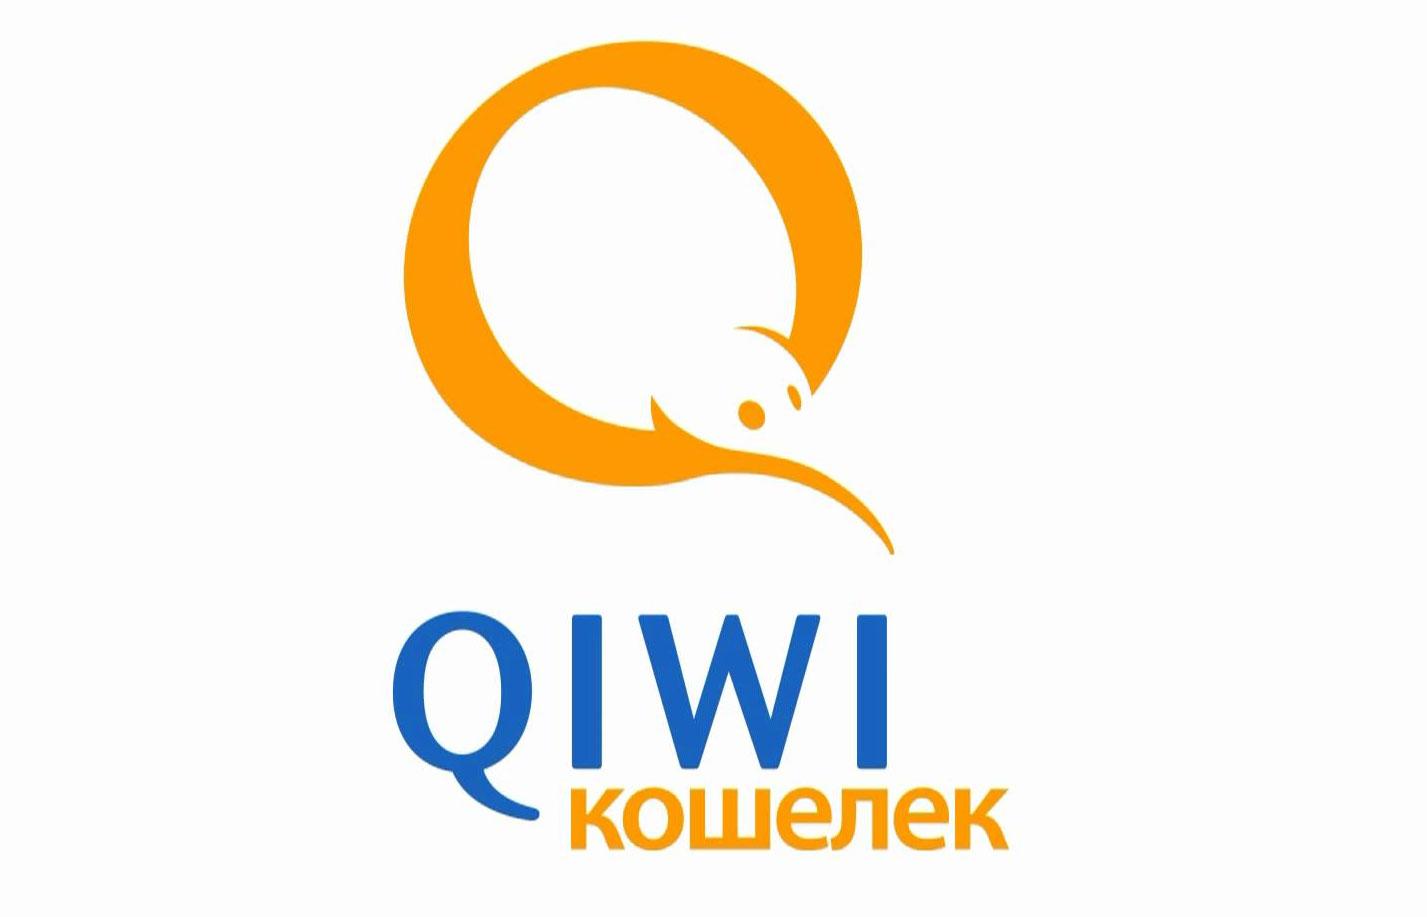 QIVI money transfer.jpg